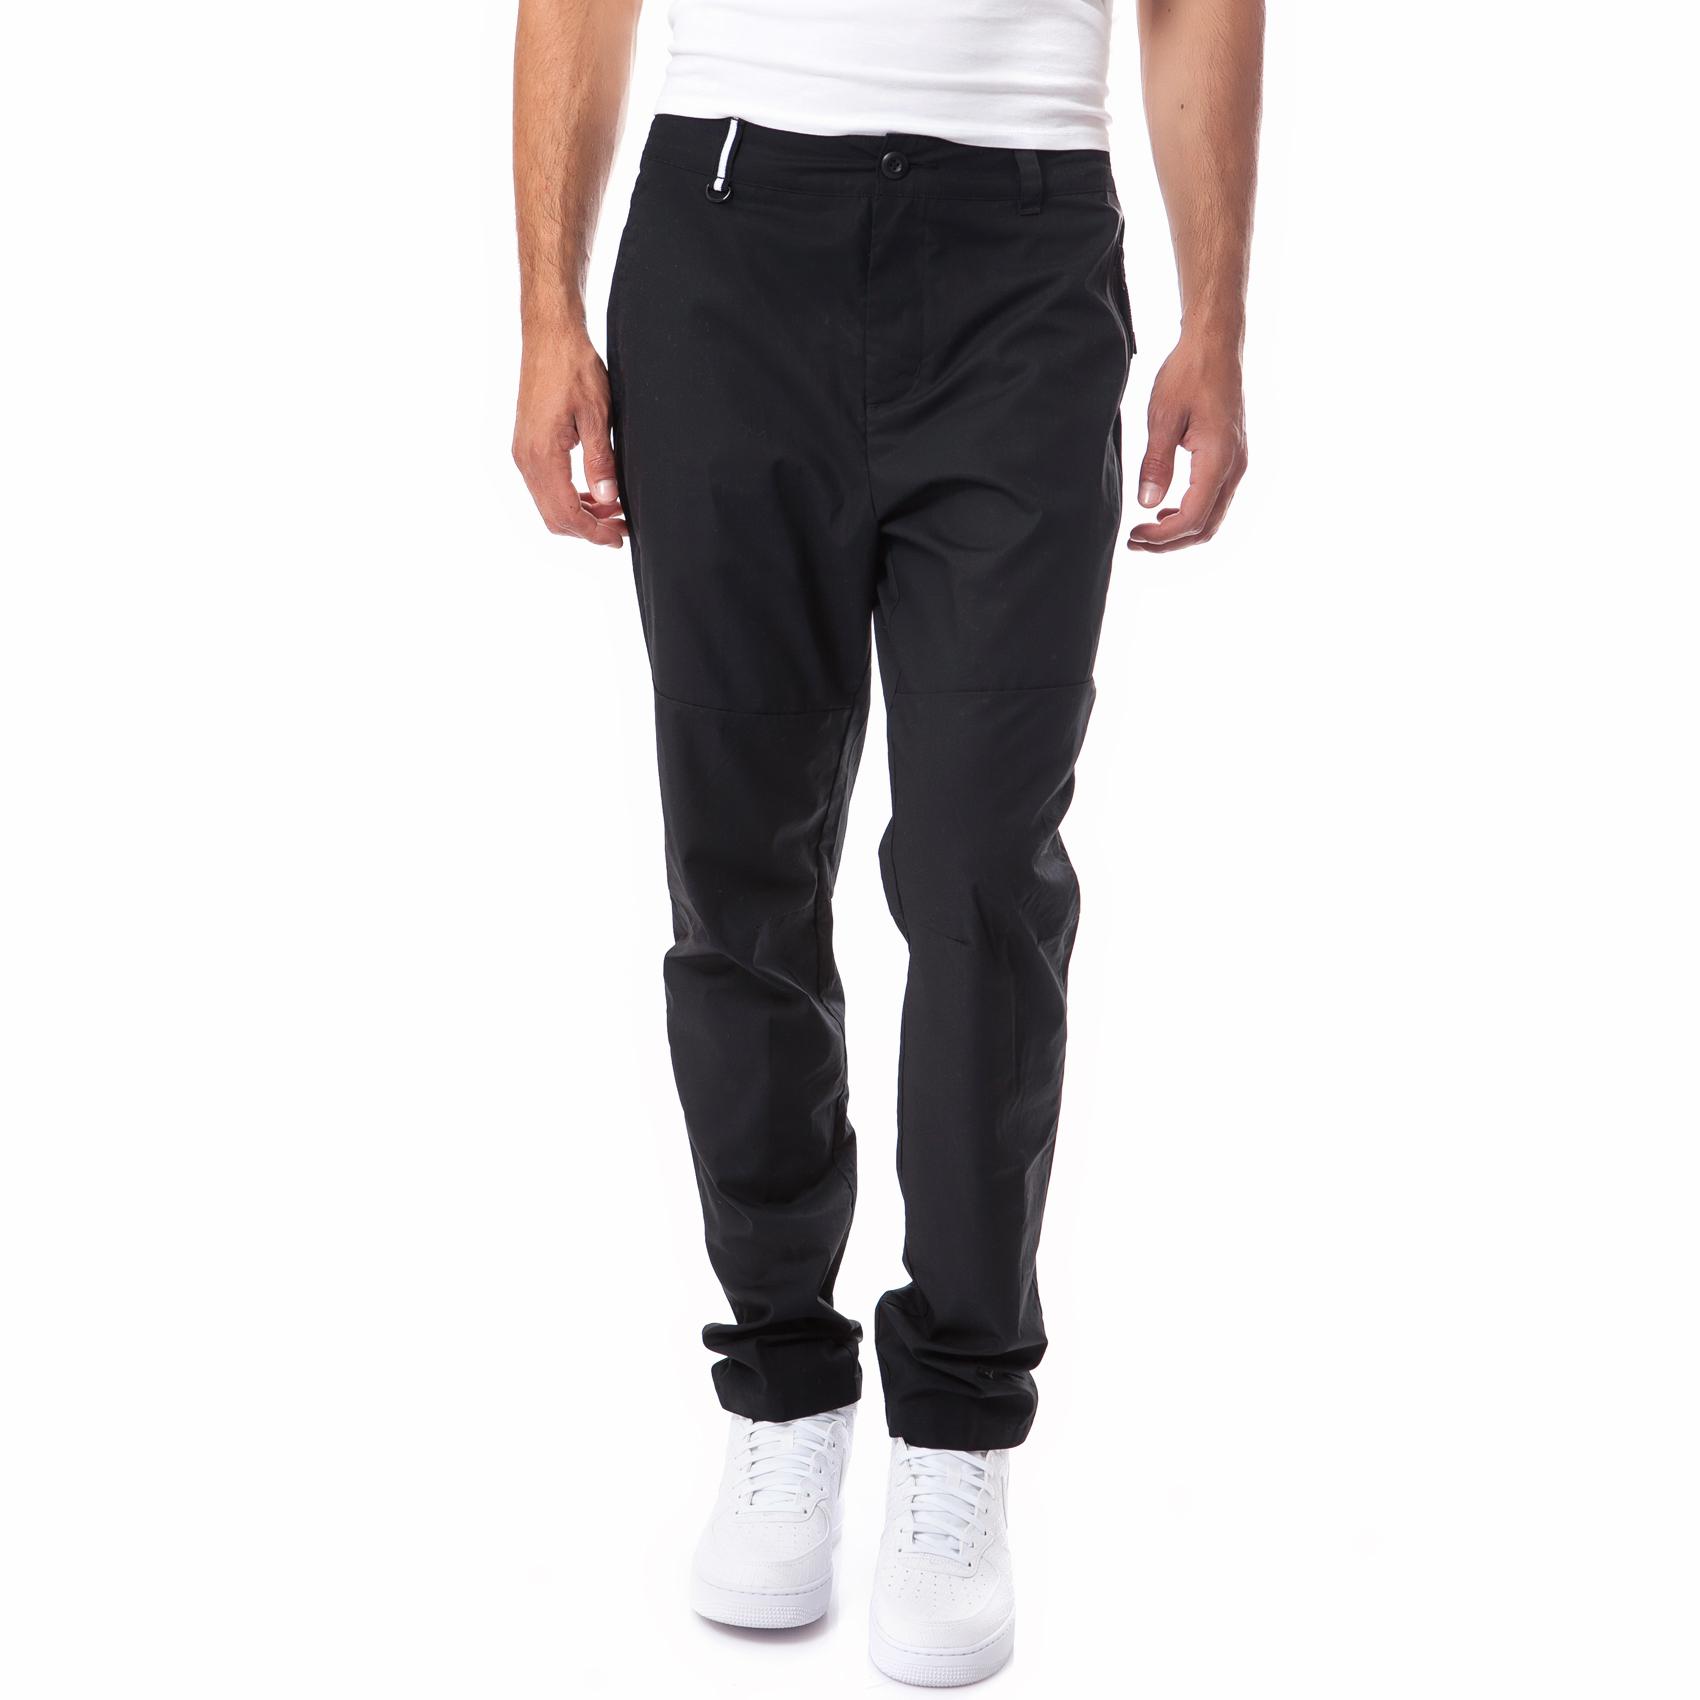 NIKE - Ανδρικό παντελόνι Nike μαύρο ανδρικά ρούχα αθλητικά φόρμες